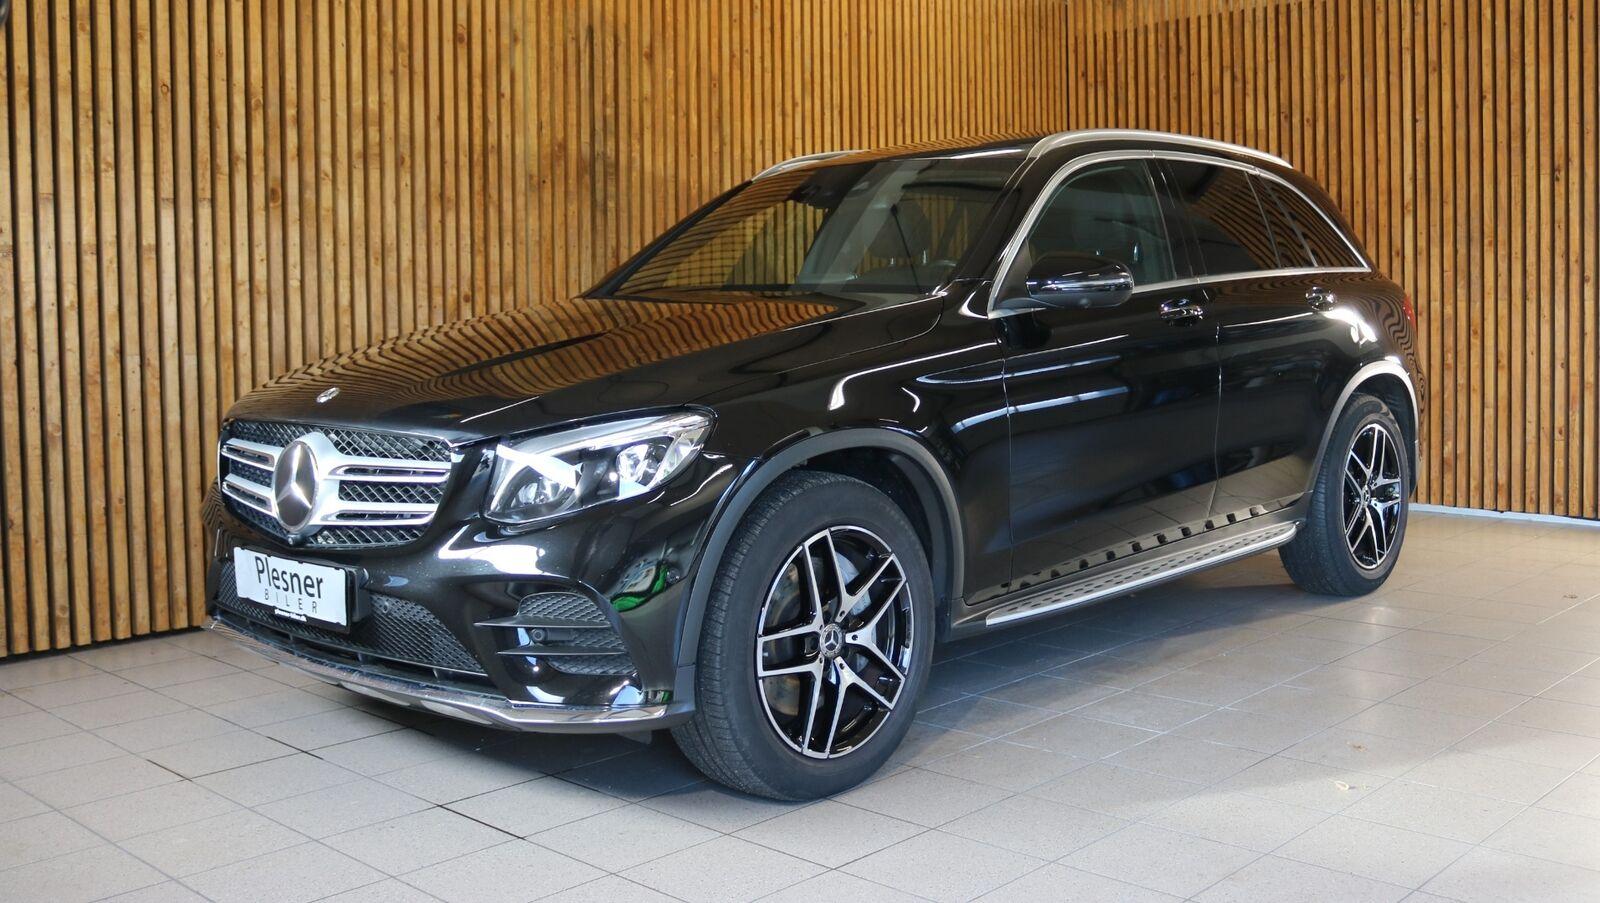 Mercedes GLC250 d 2,2 AMG Line aut. 4Matic 5d